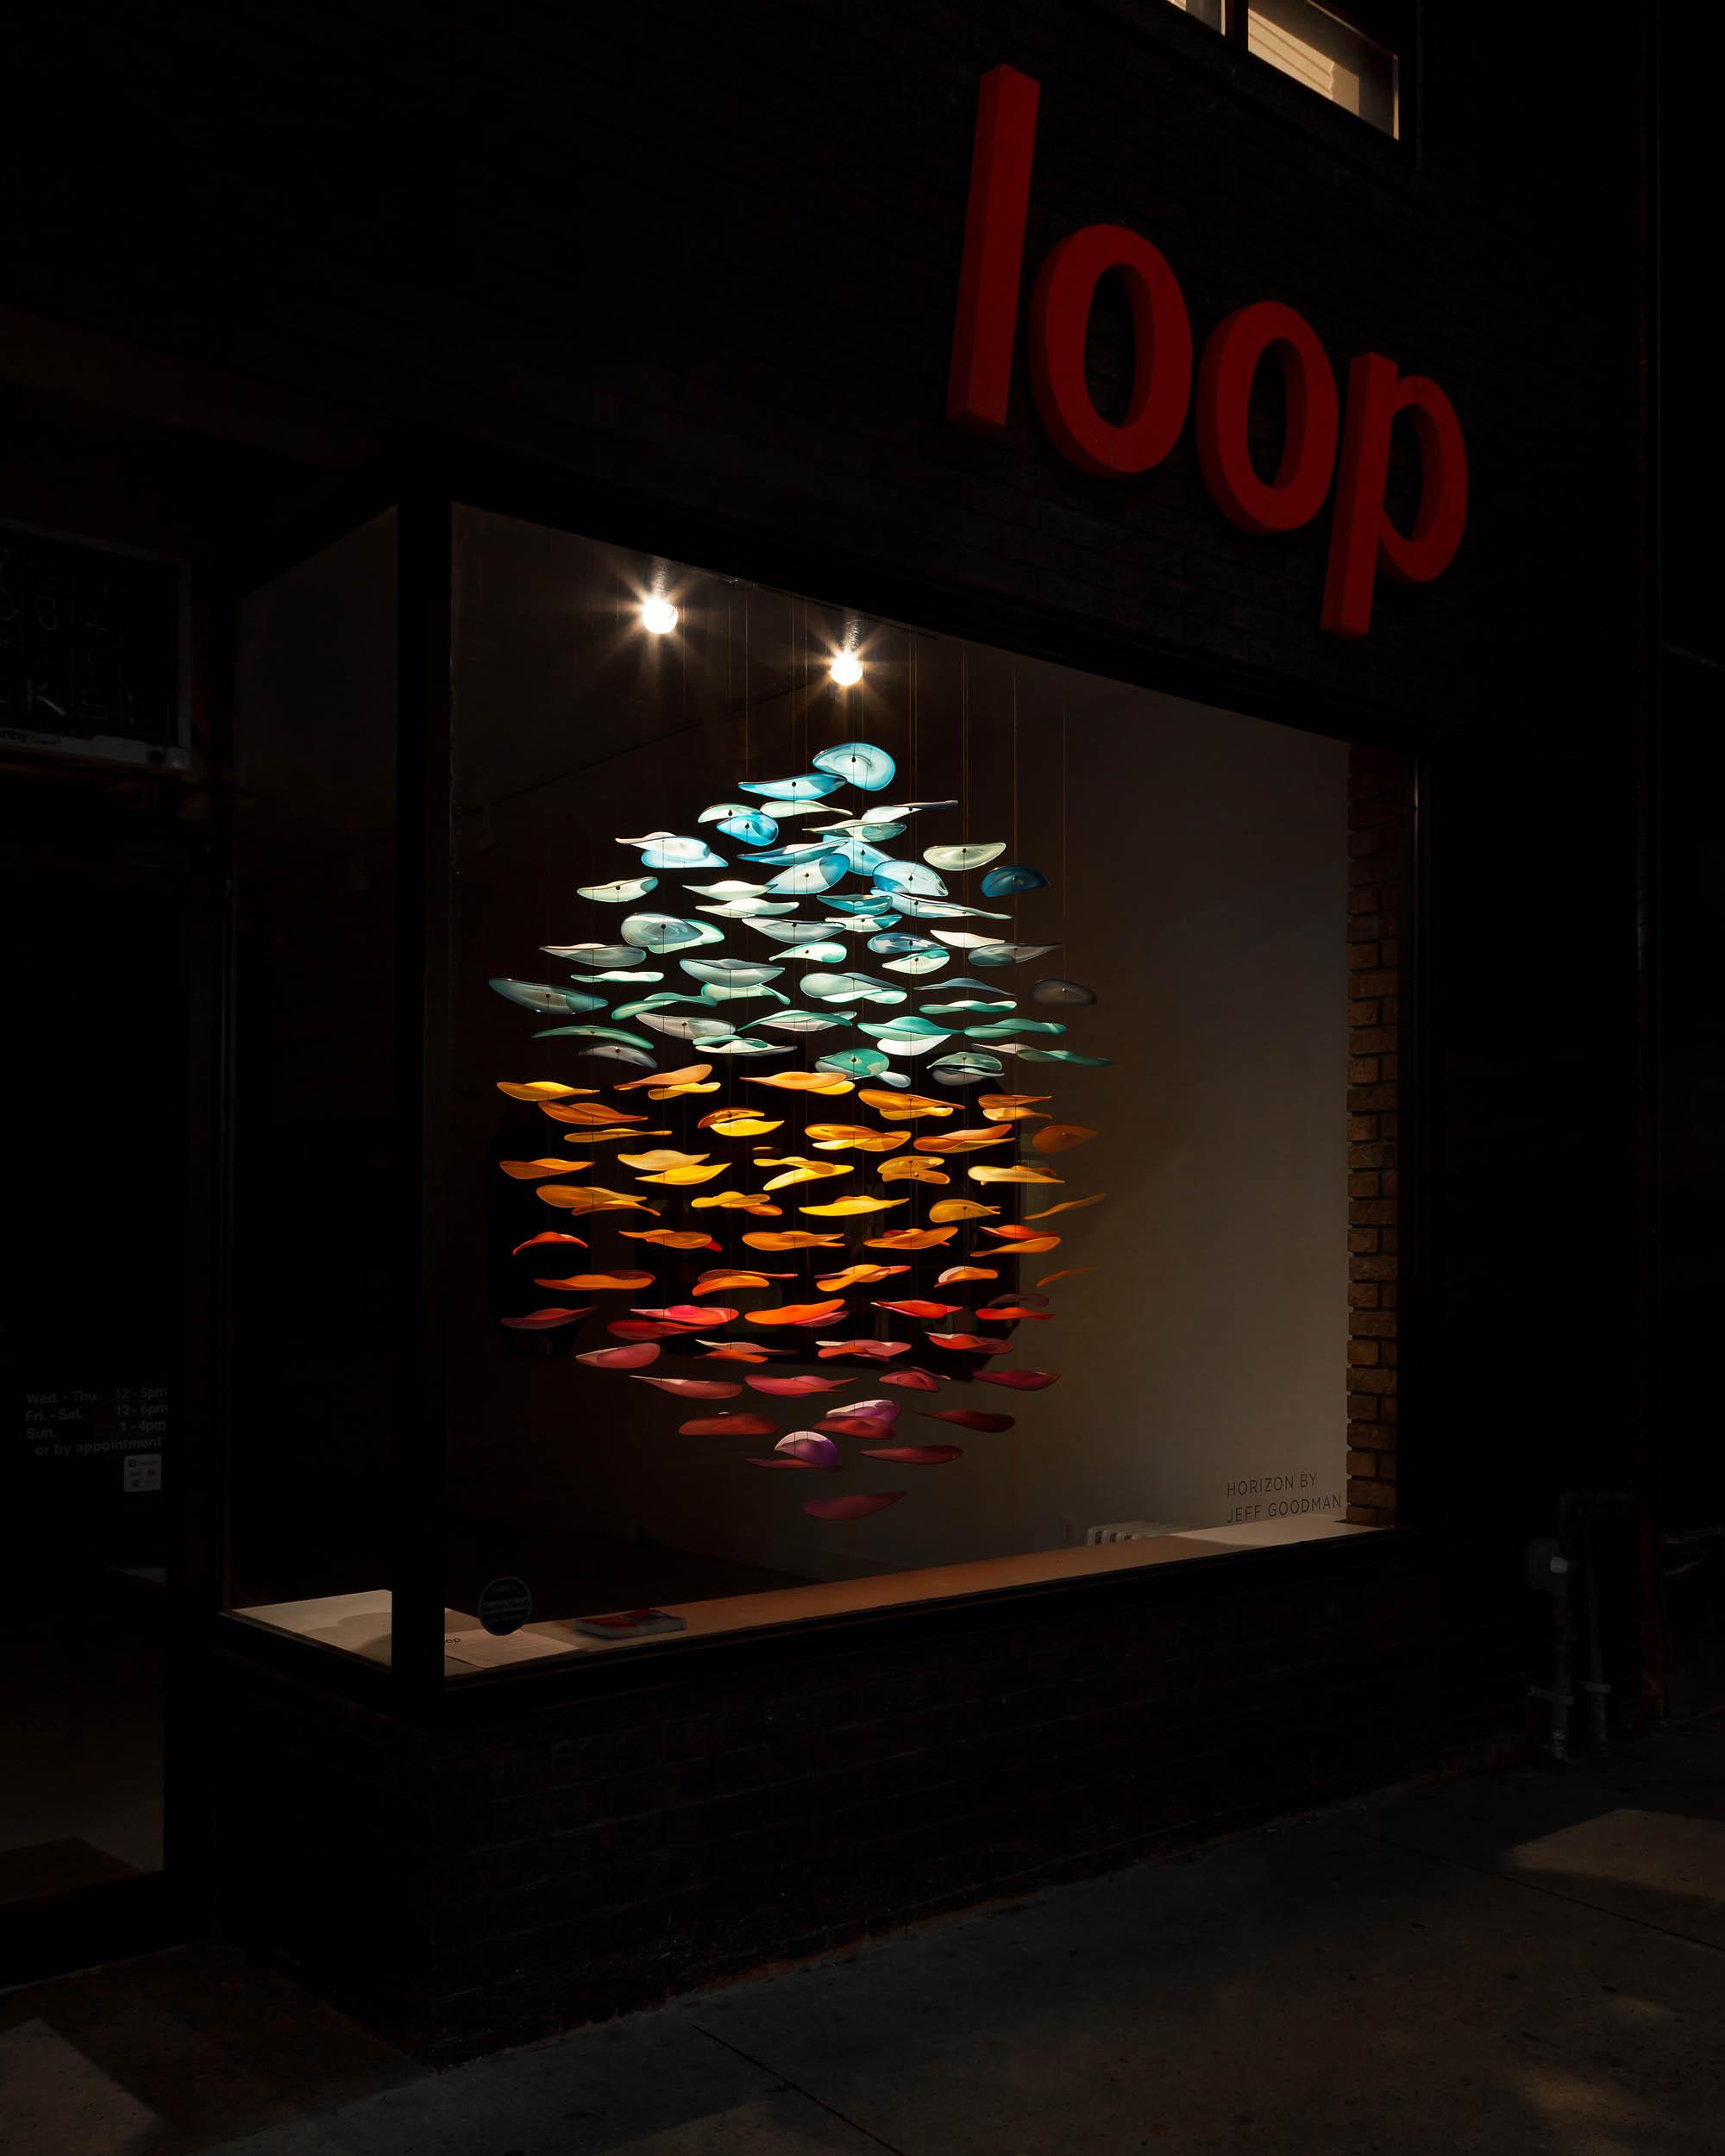 Exhibition Photos by Worker Bee Supply of Blown Glass Sculpture Horizon by Jeff Goodman Studio